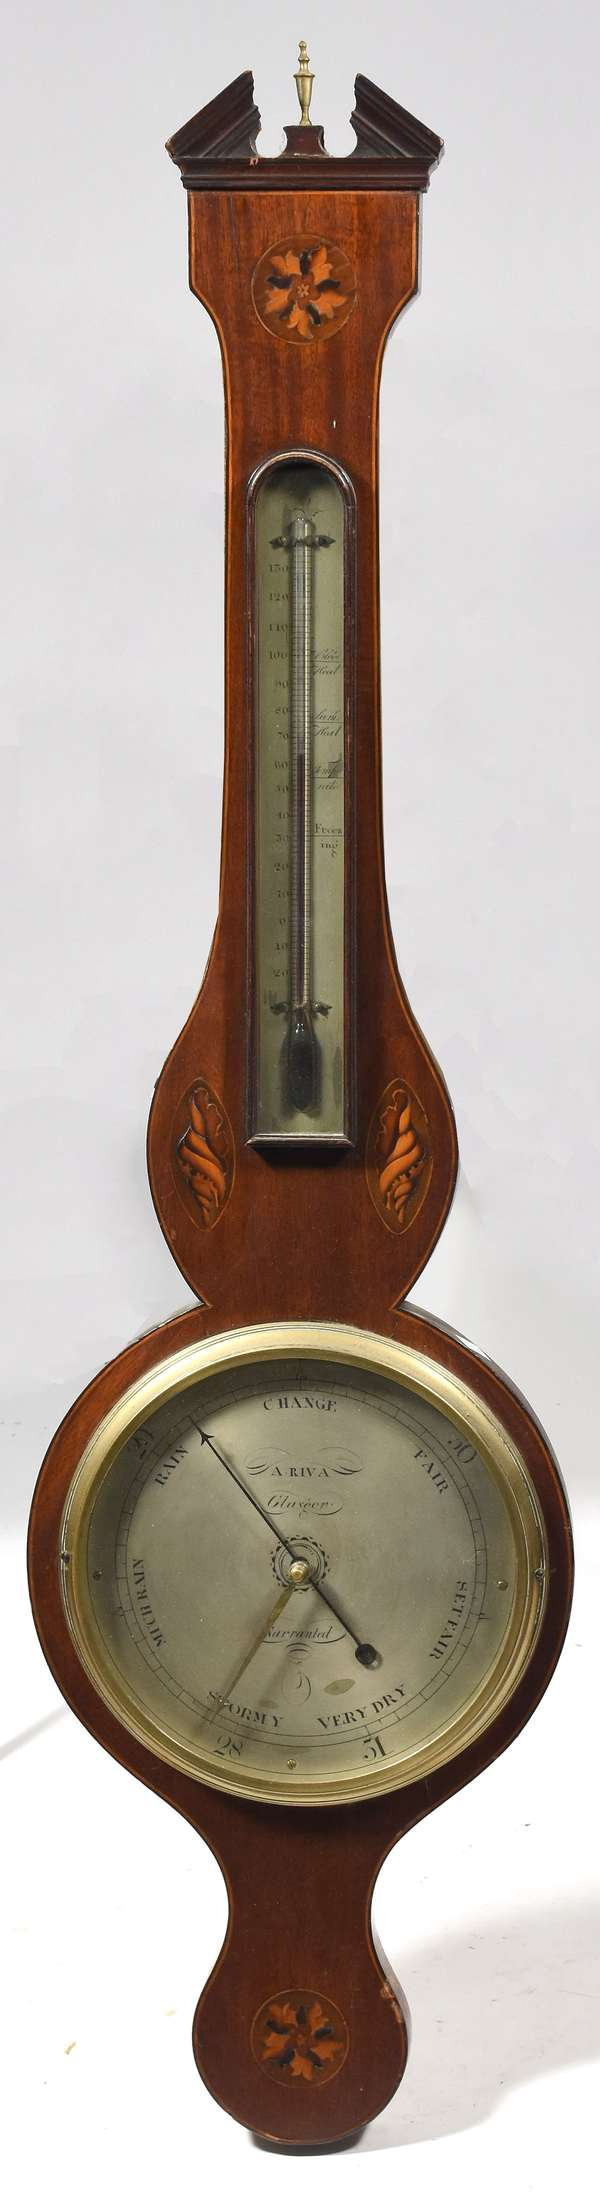 "19th C. Barometer A. Riva, Glasgow, inlaid wagon wheel design, 39""H."